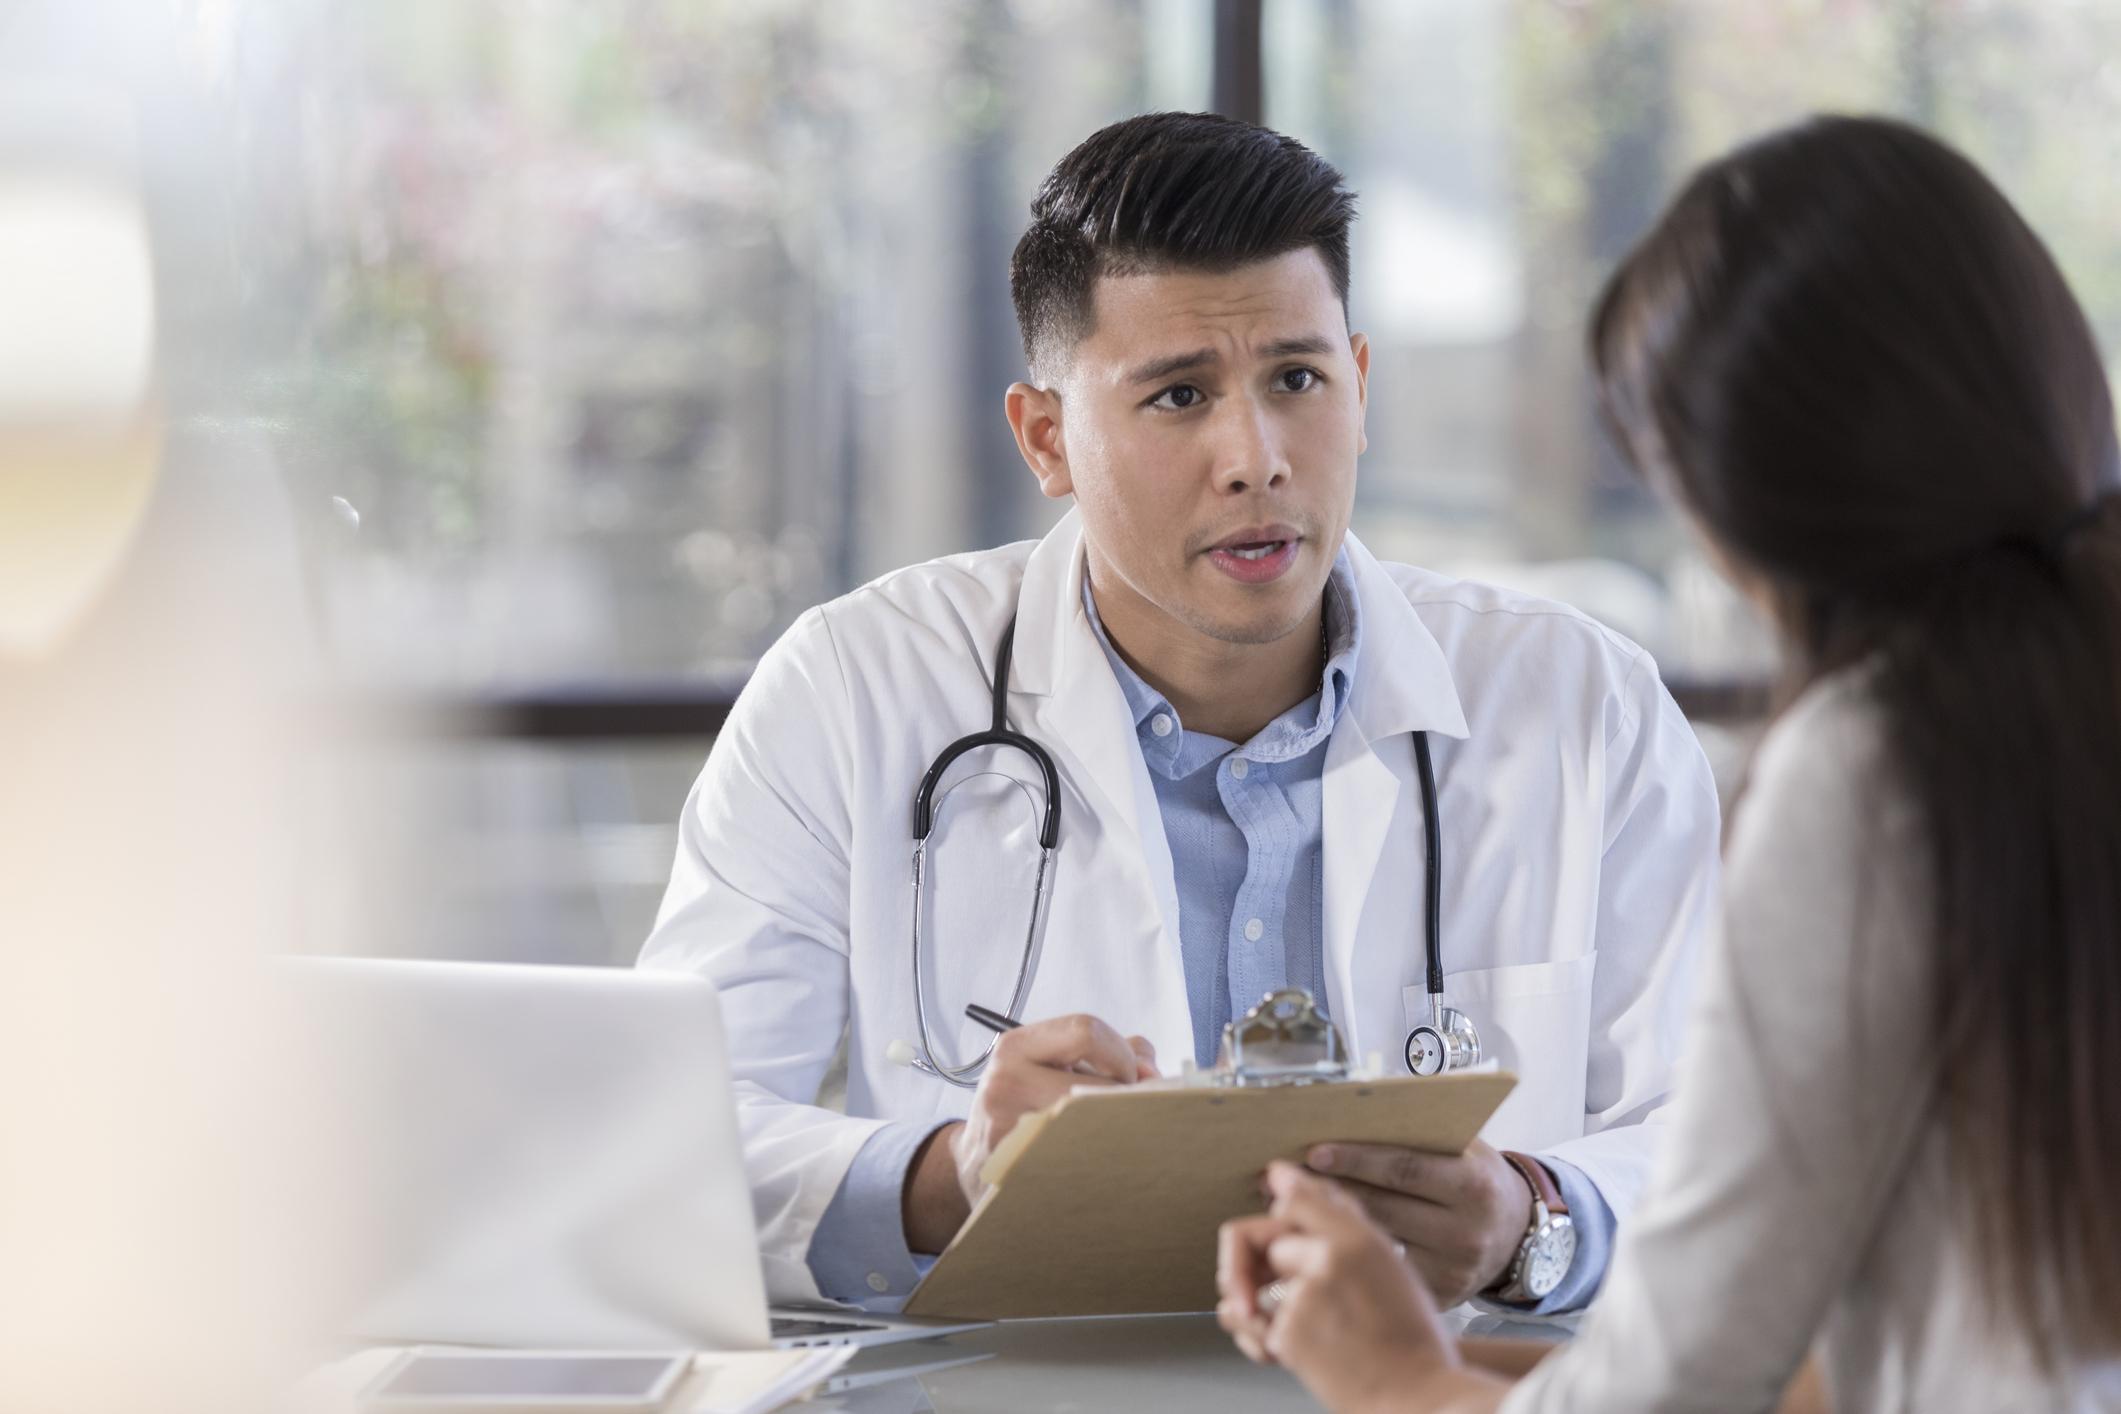 Physician discusses diagnosis with patient's parents.